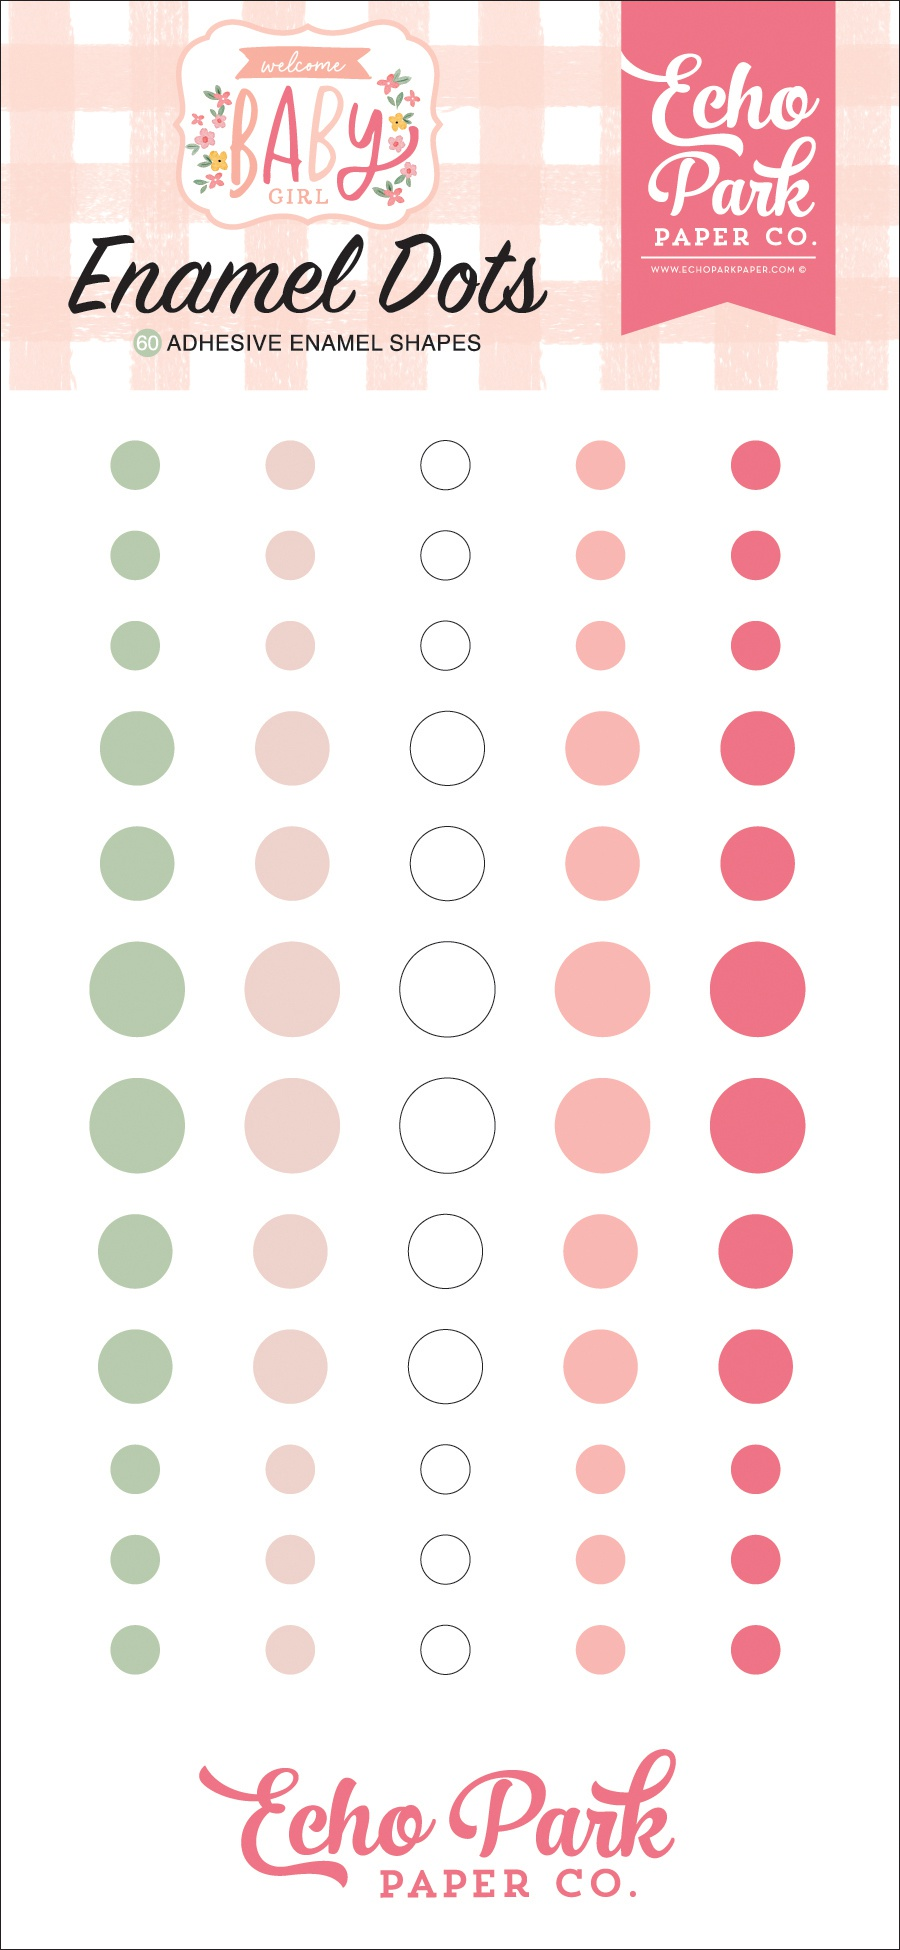 Echo Park - Welcome Baby Girl - Enamel Dots